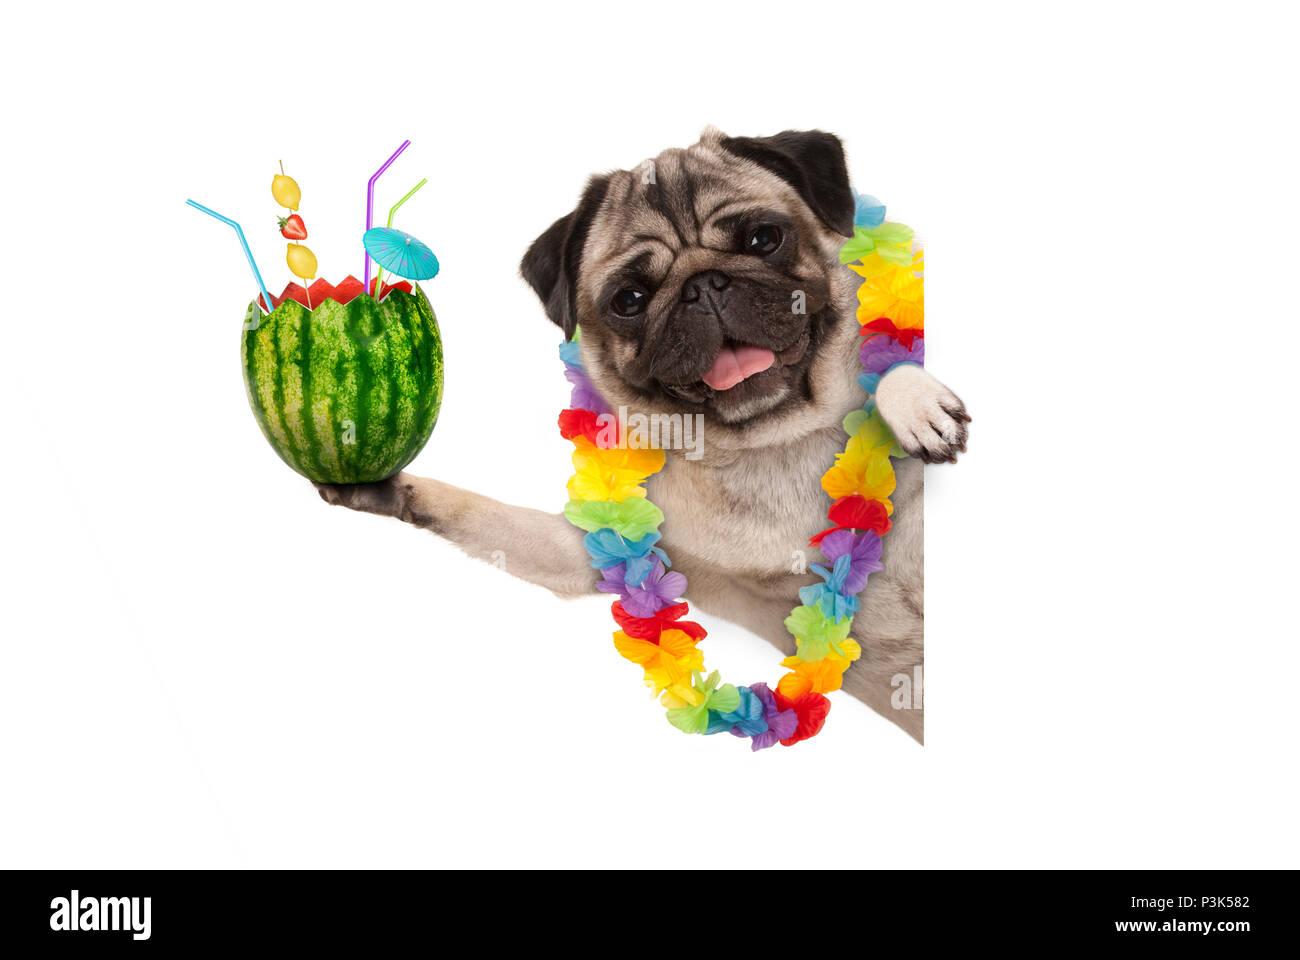 Frolic summer pug dog with hawaiian flower garland holding frolic summer pug dog with hawaiian flower garland holding watermelon cocktail with umbrella and straws isolated on white background izmirmasajfo